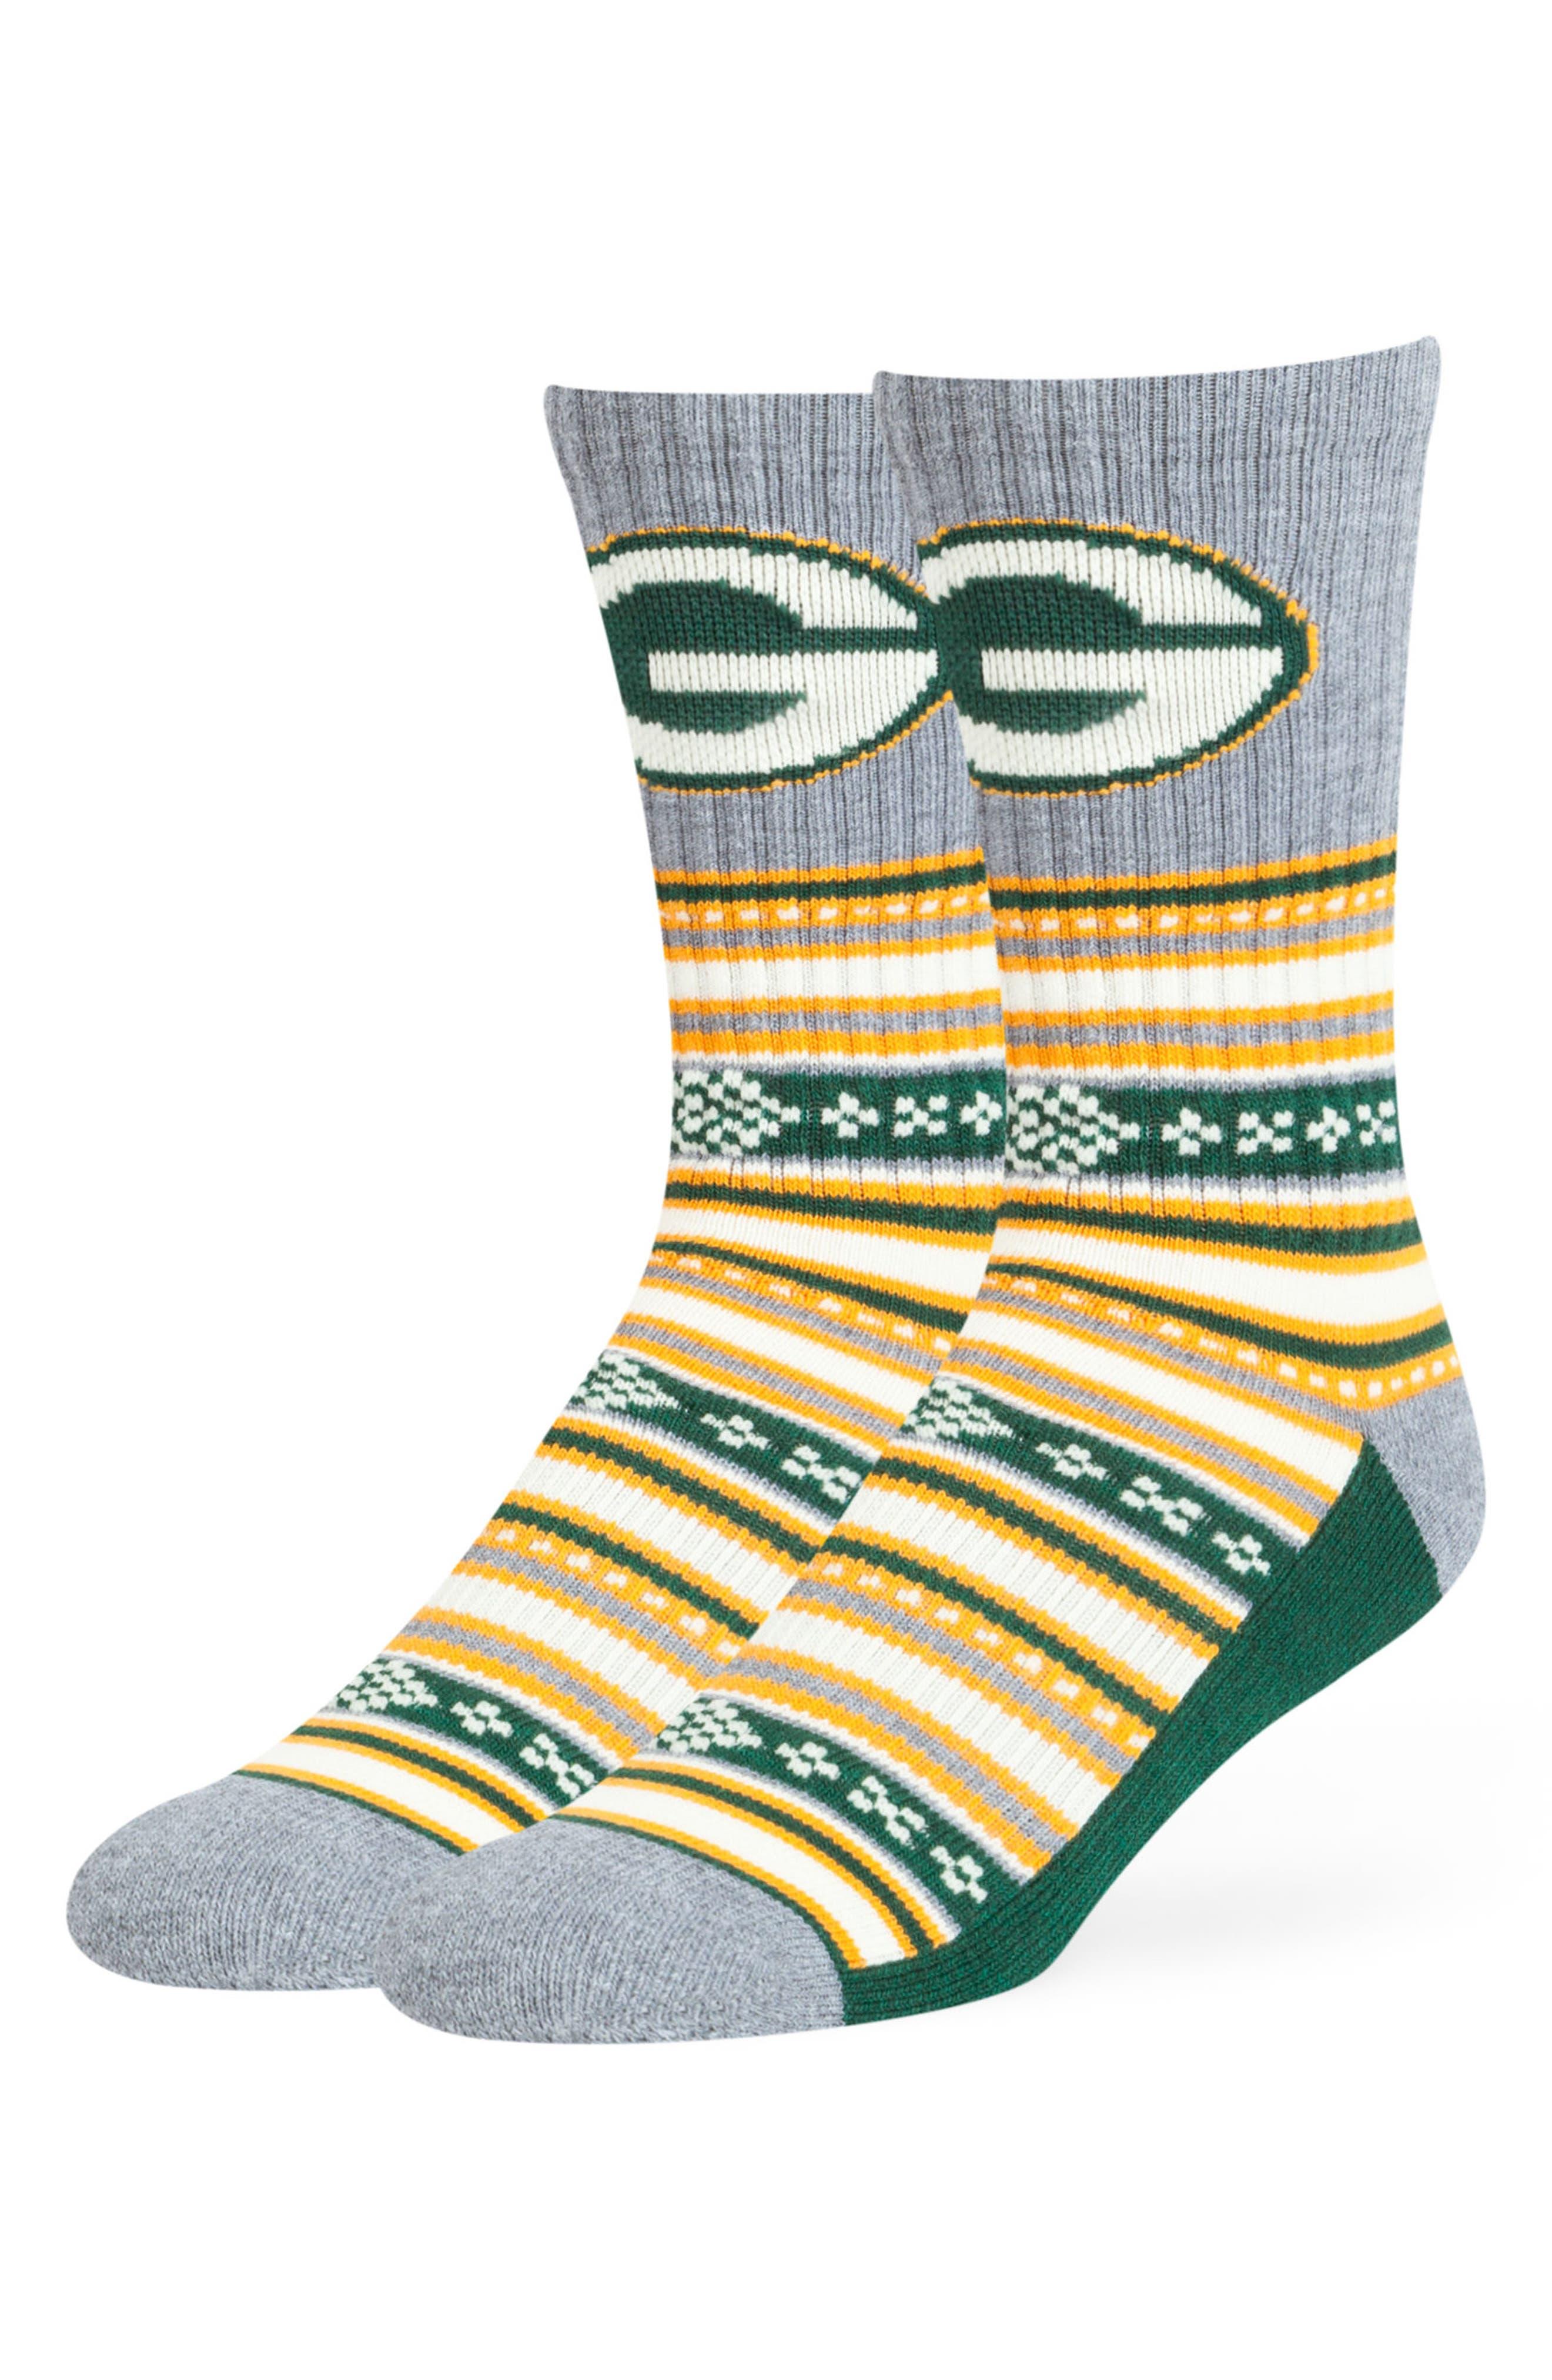 '47 McGreggor NFL Fair Isle Socks